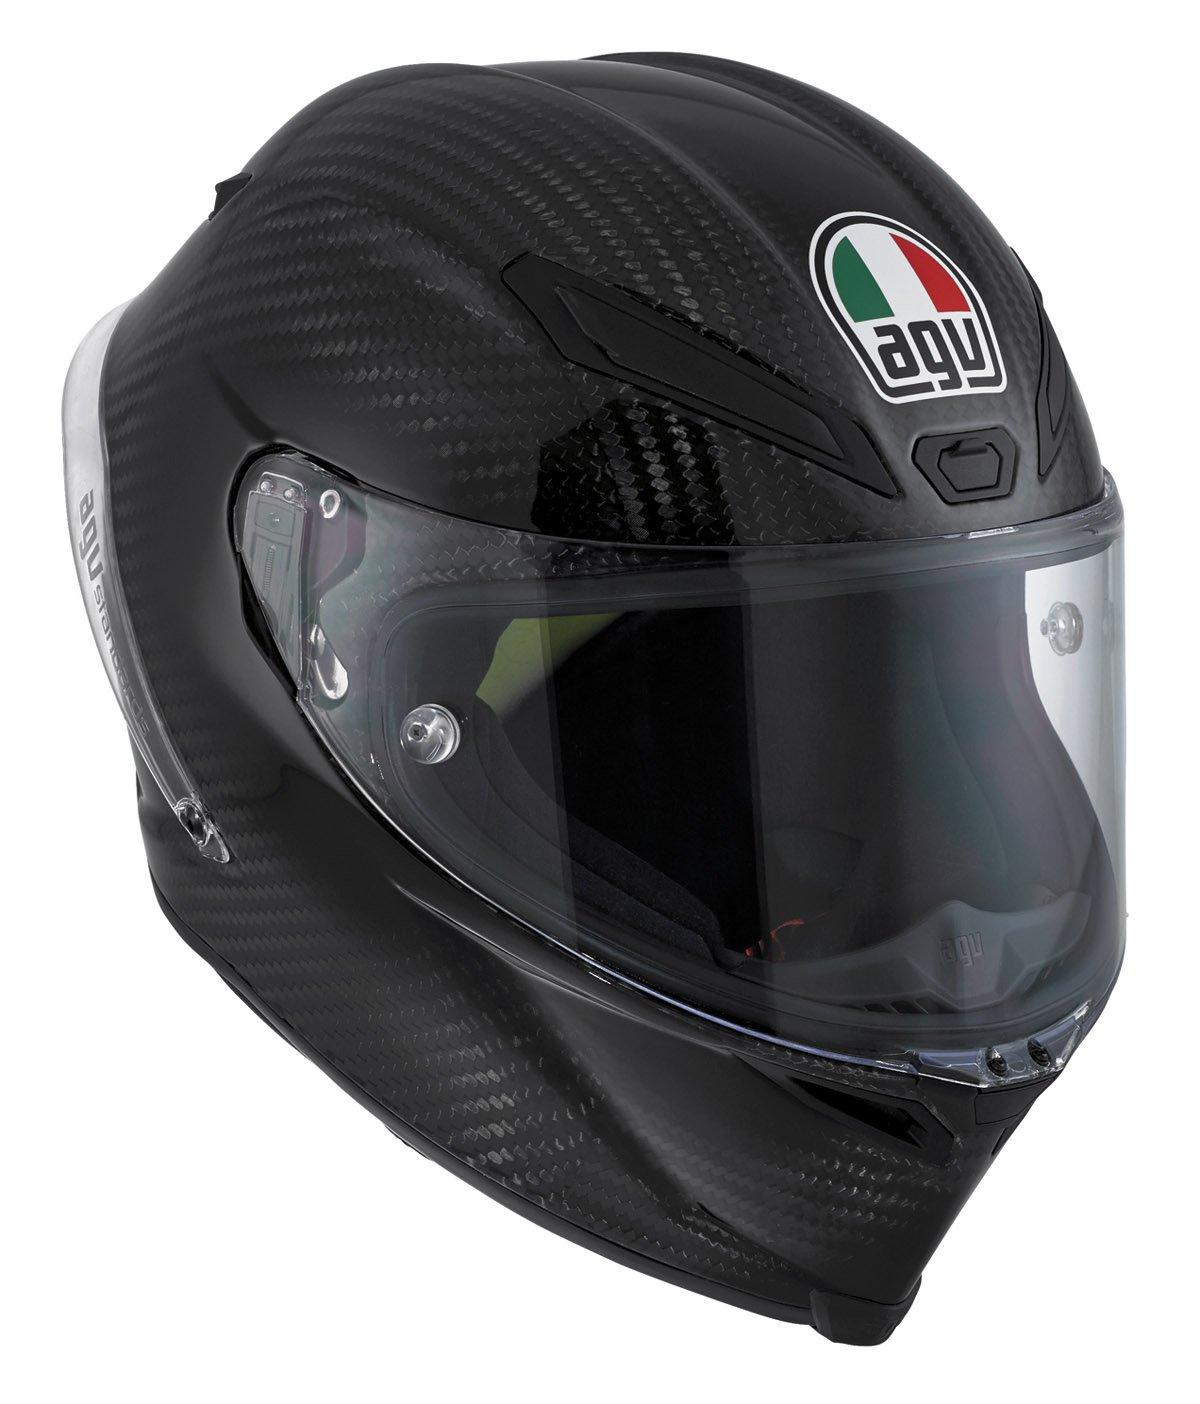 AGV J6001A4DW002XL Casco Pista GP E2205 Solid W, Grigio (Carbon), XL